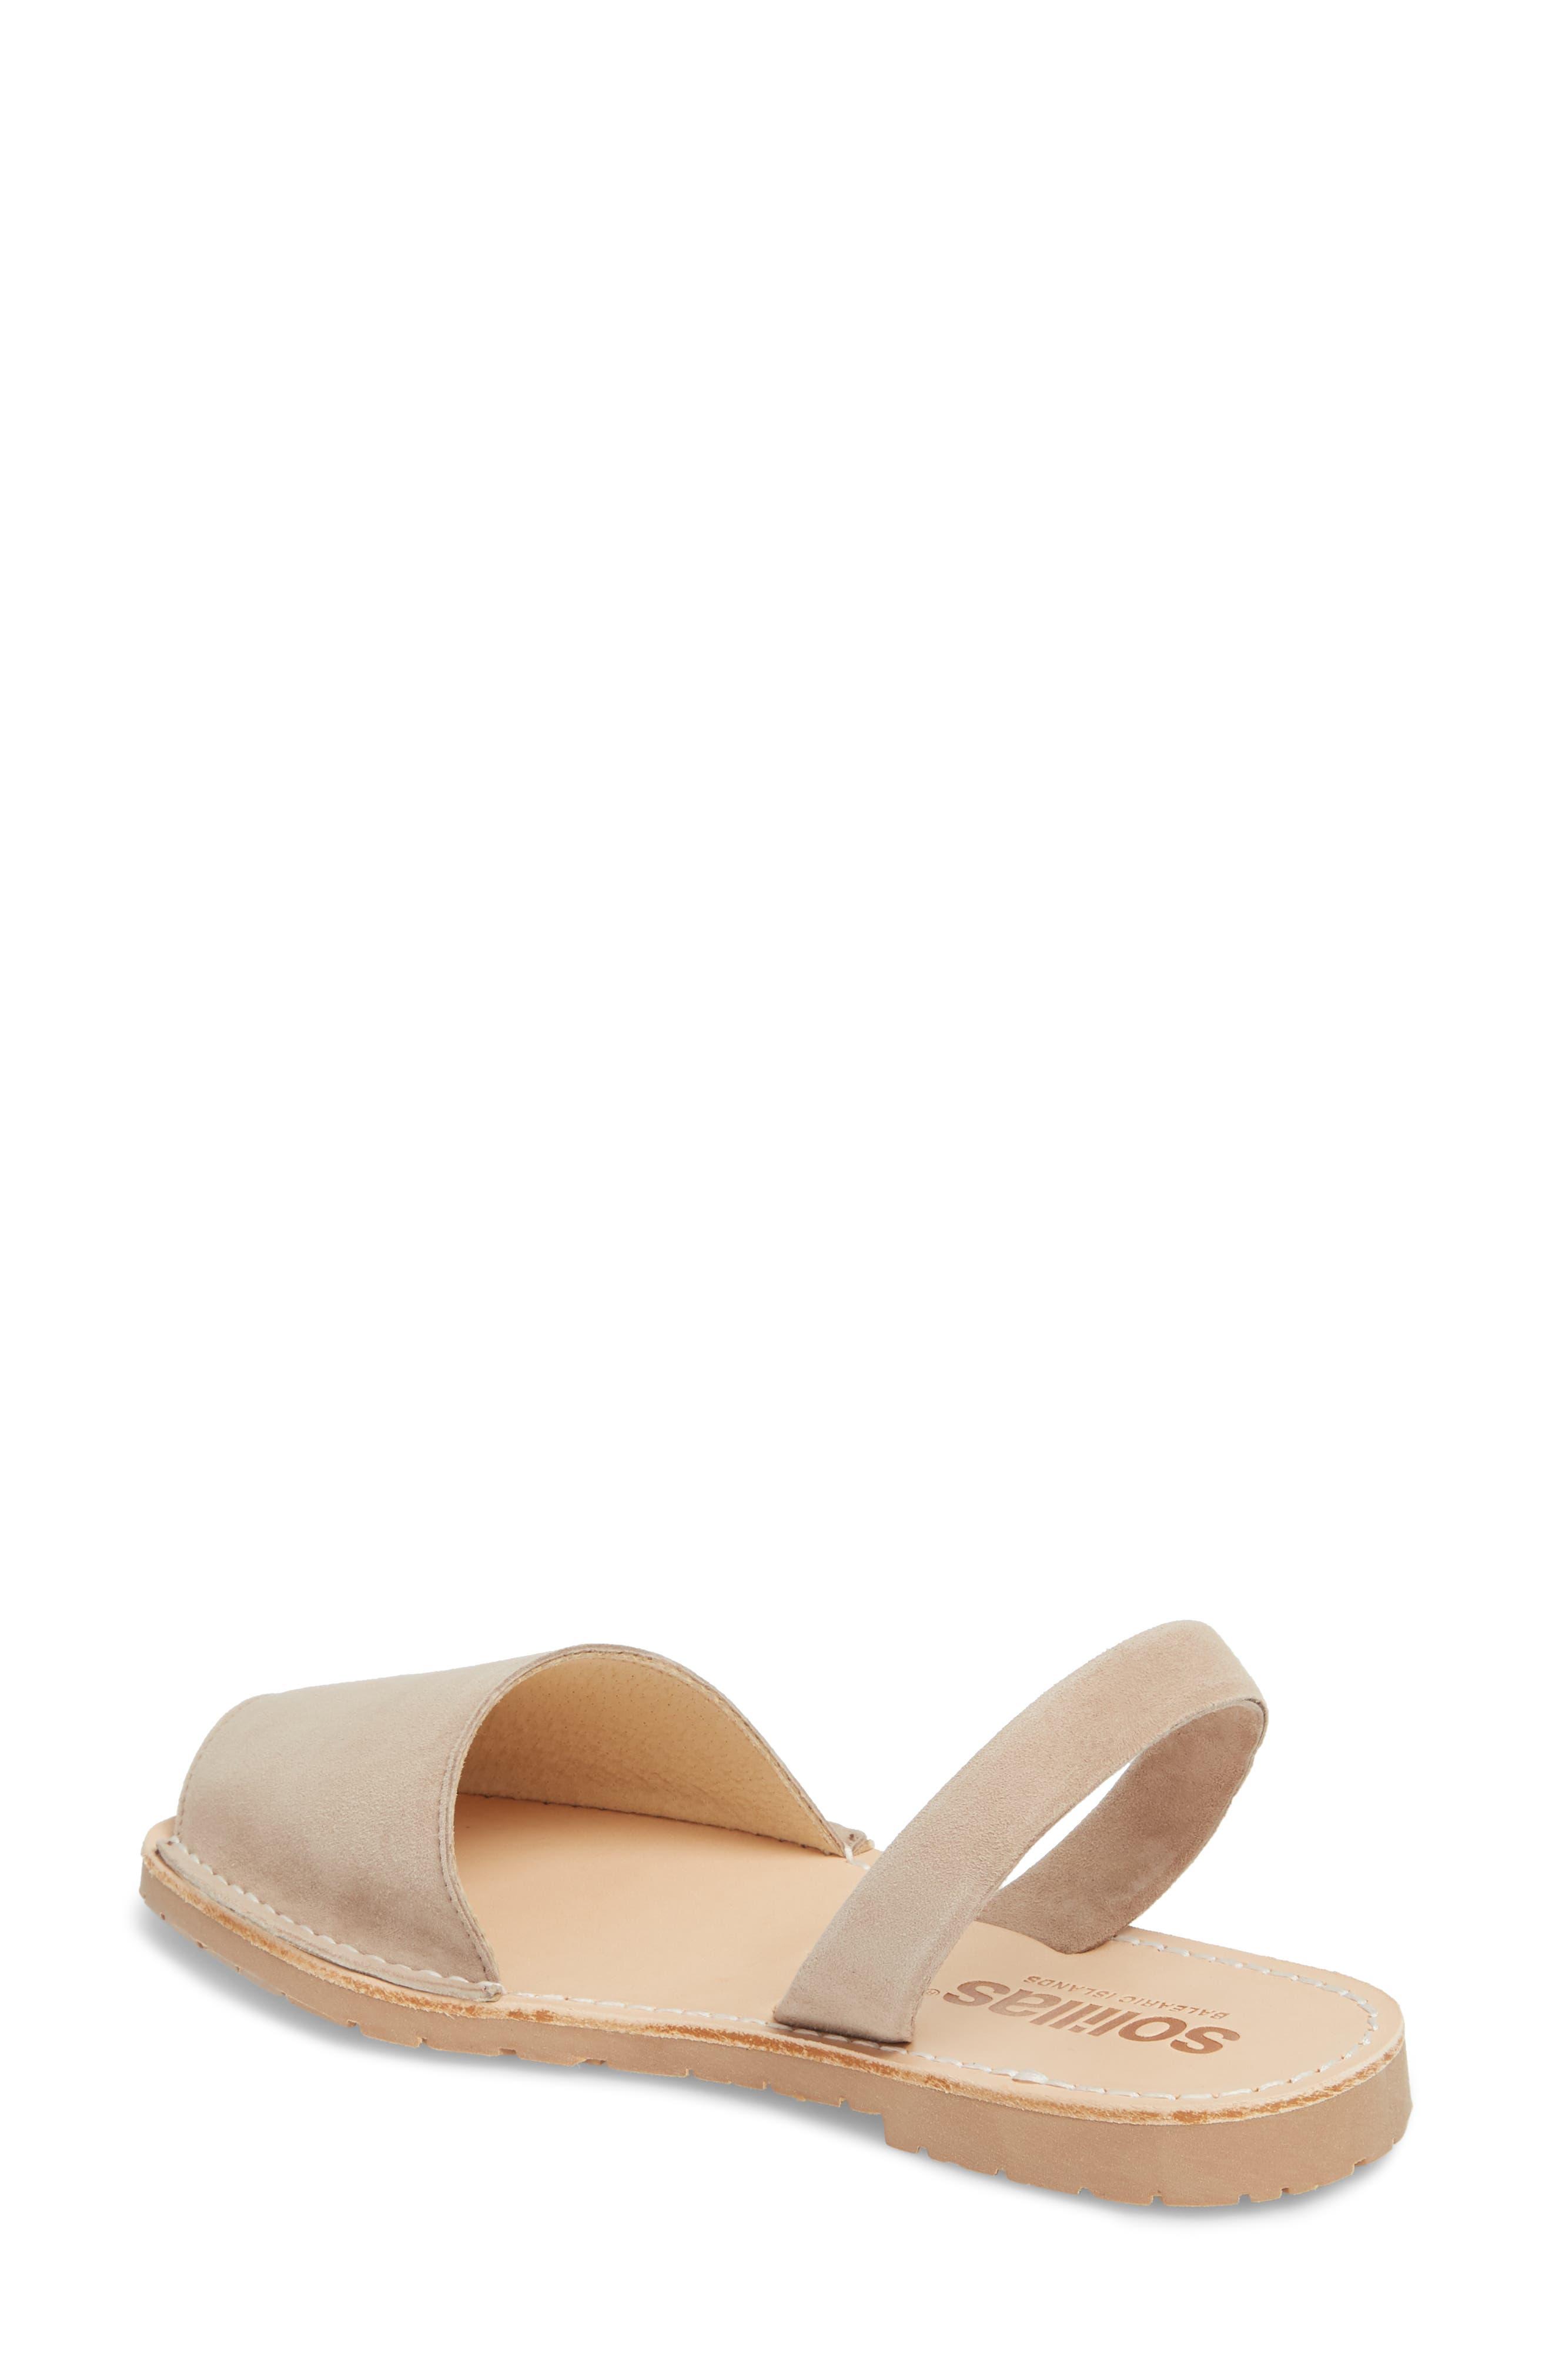 SOLILLAS,                             Flat Sandal,                             Alternate thumbnail 2, color,                             TAUPE